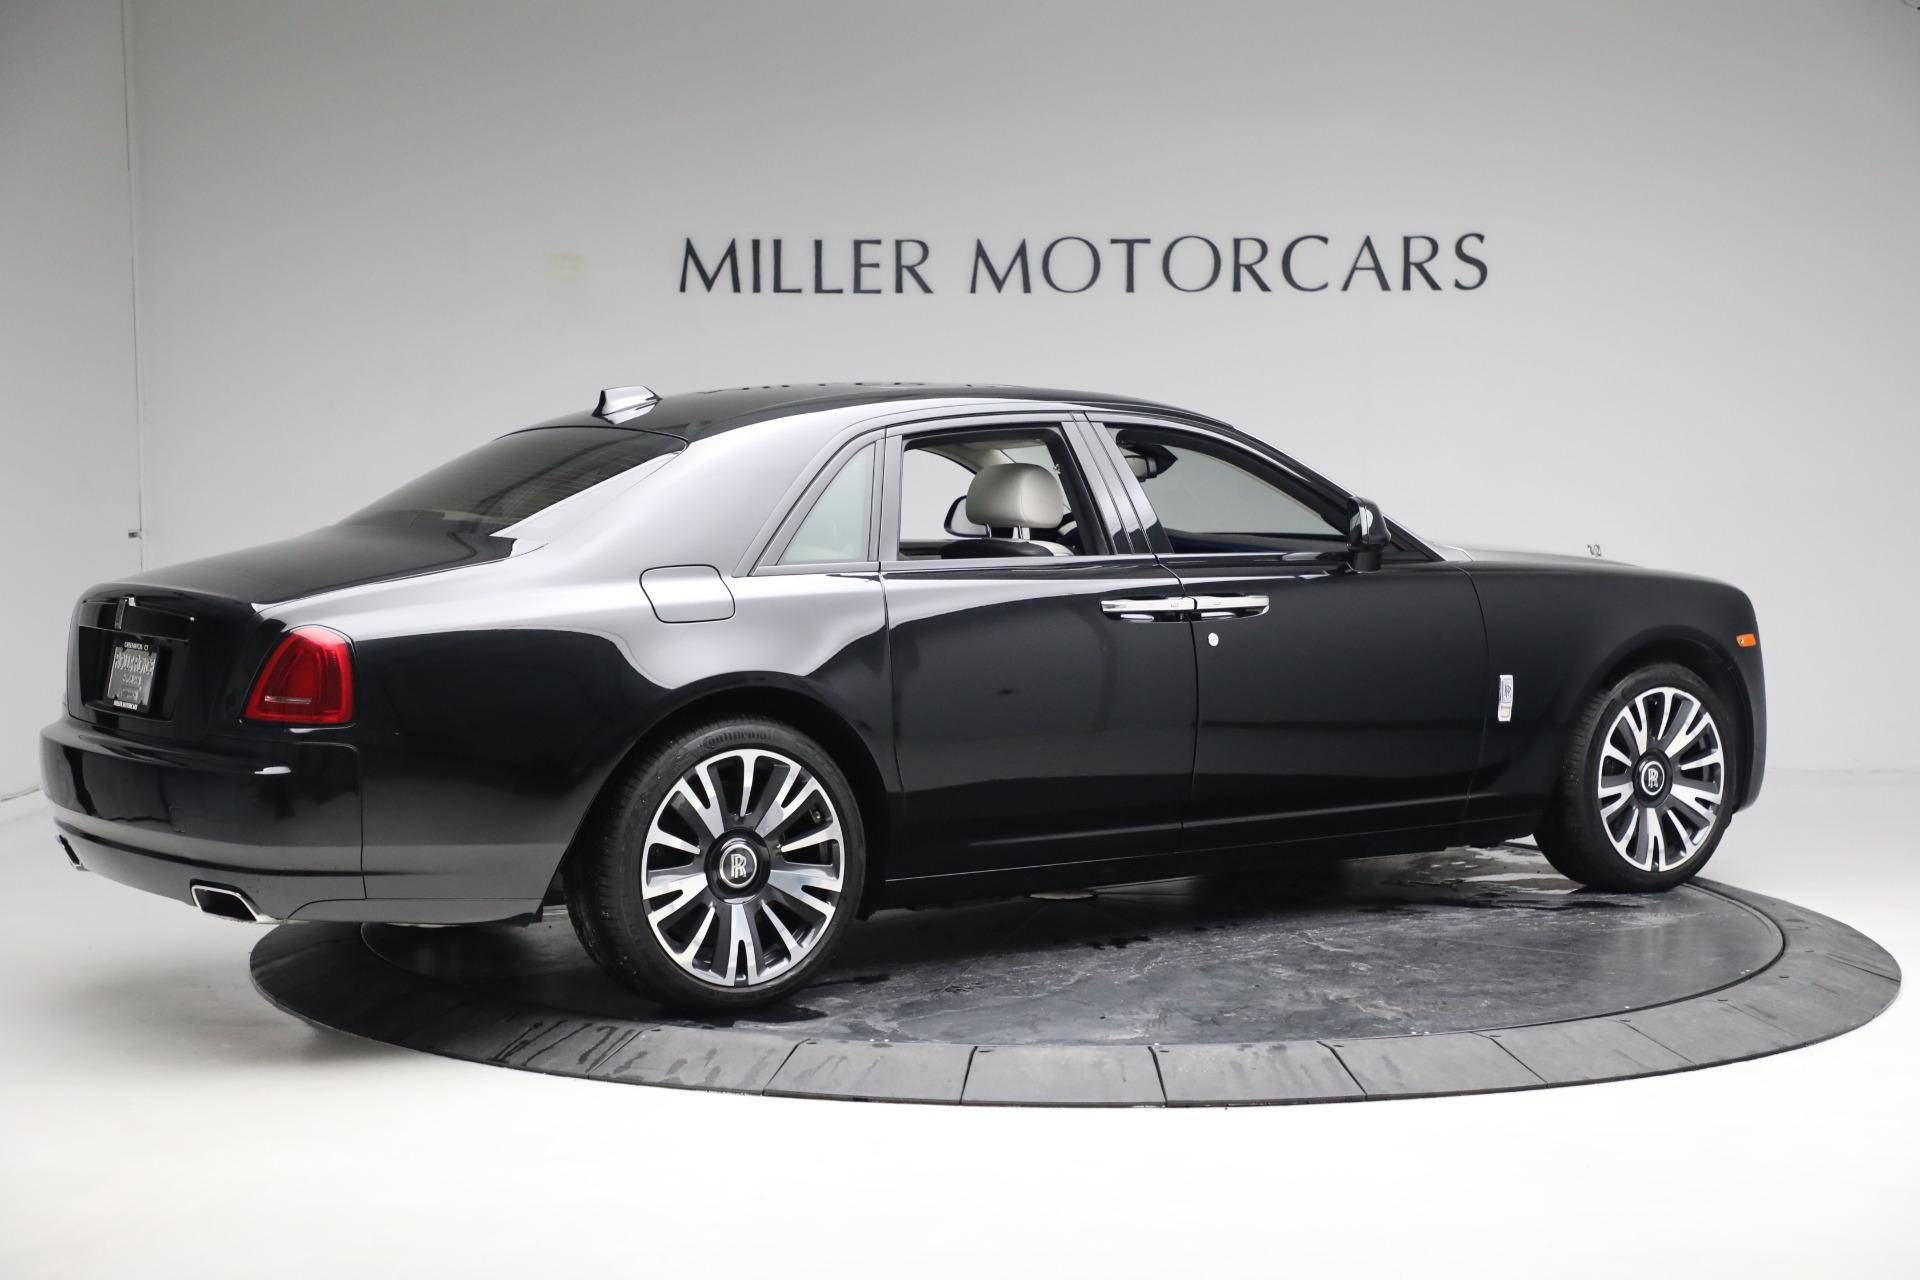 New 2019 Rolls-Royce Ghost For Sale () | Miller Motorcars ...